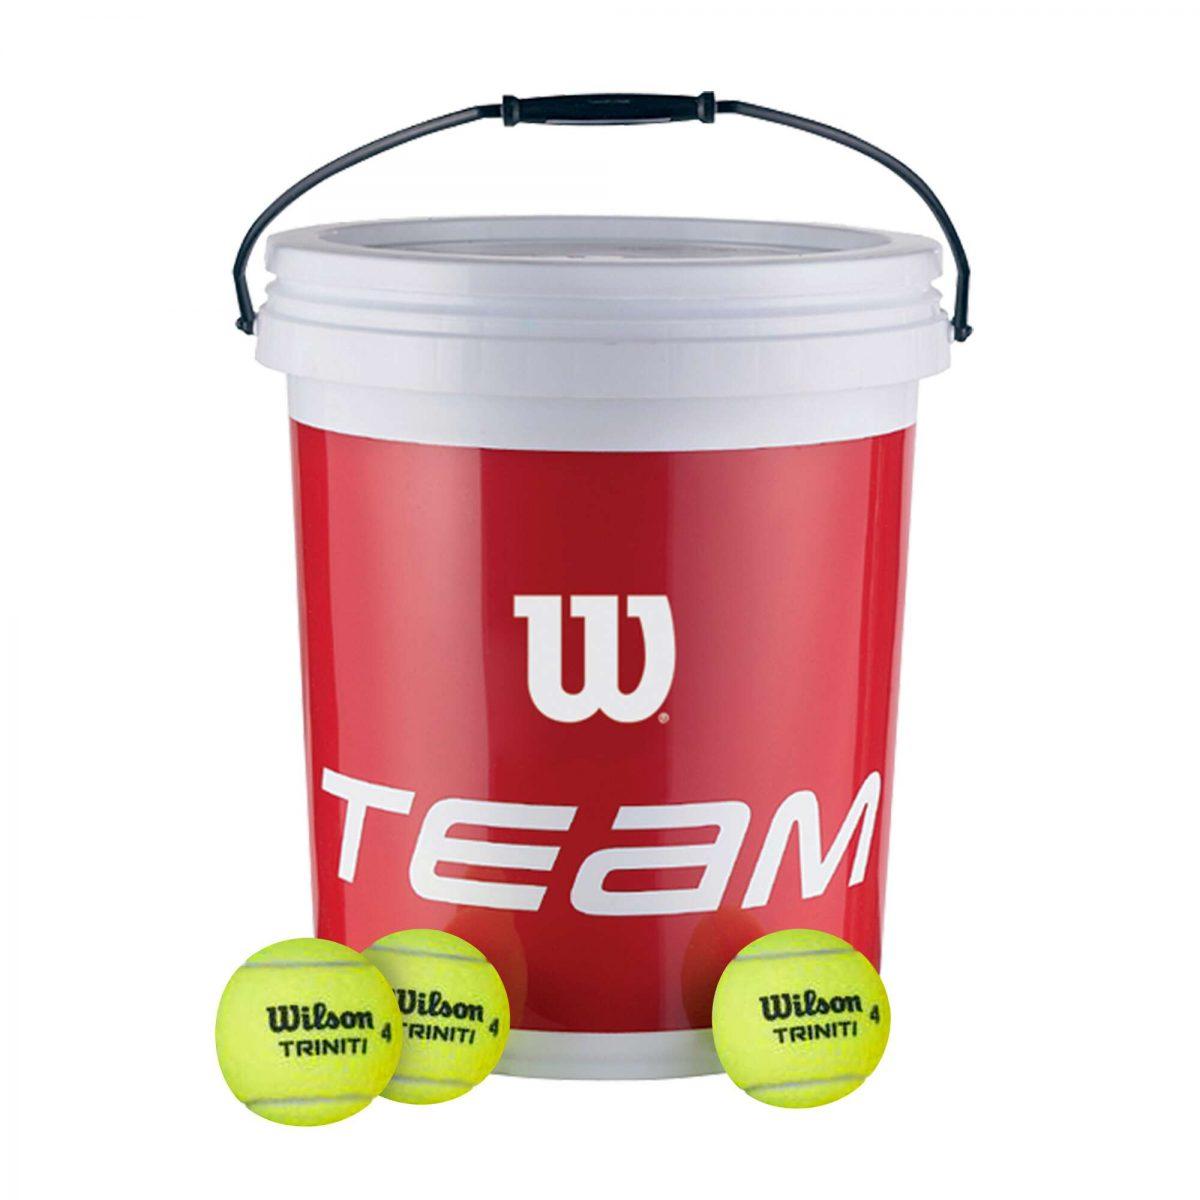 "Wilson Balleimer ""Trinity"" - Teamsport - Wilson"